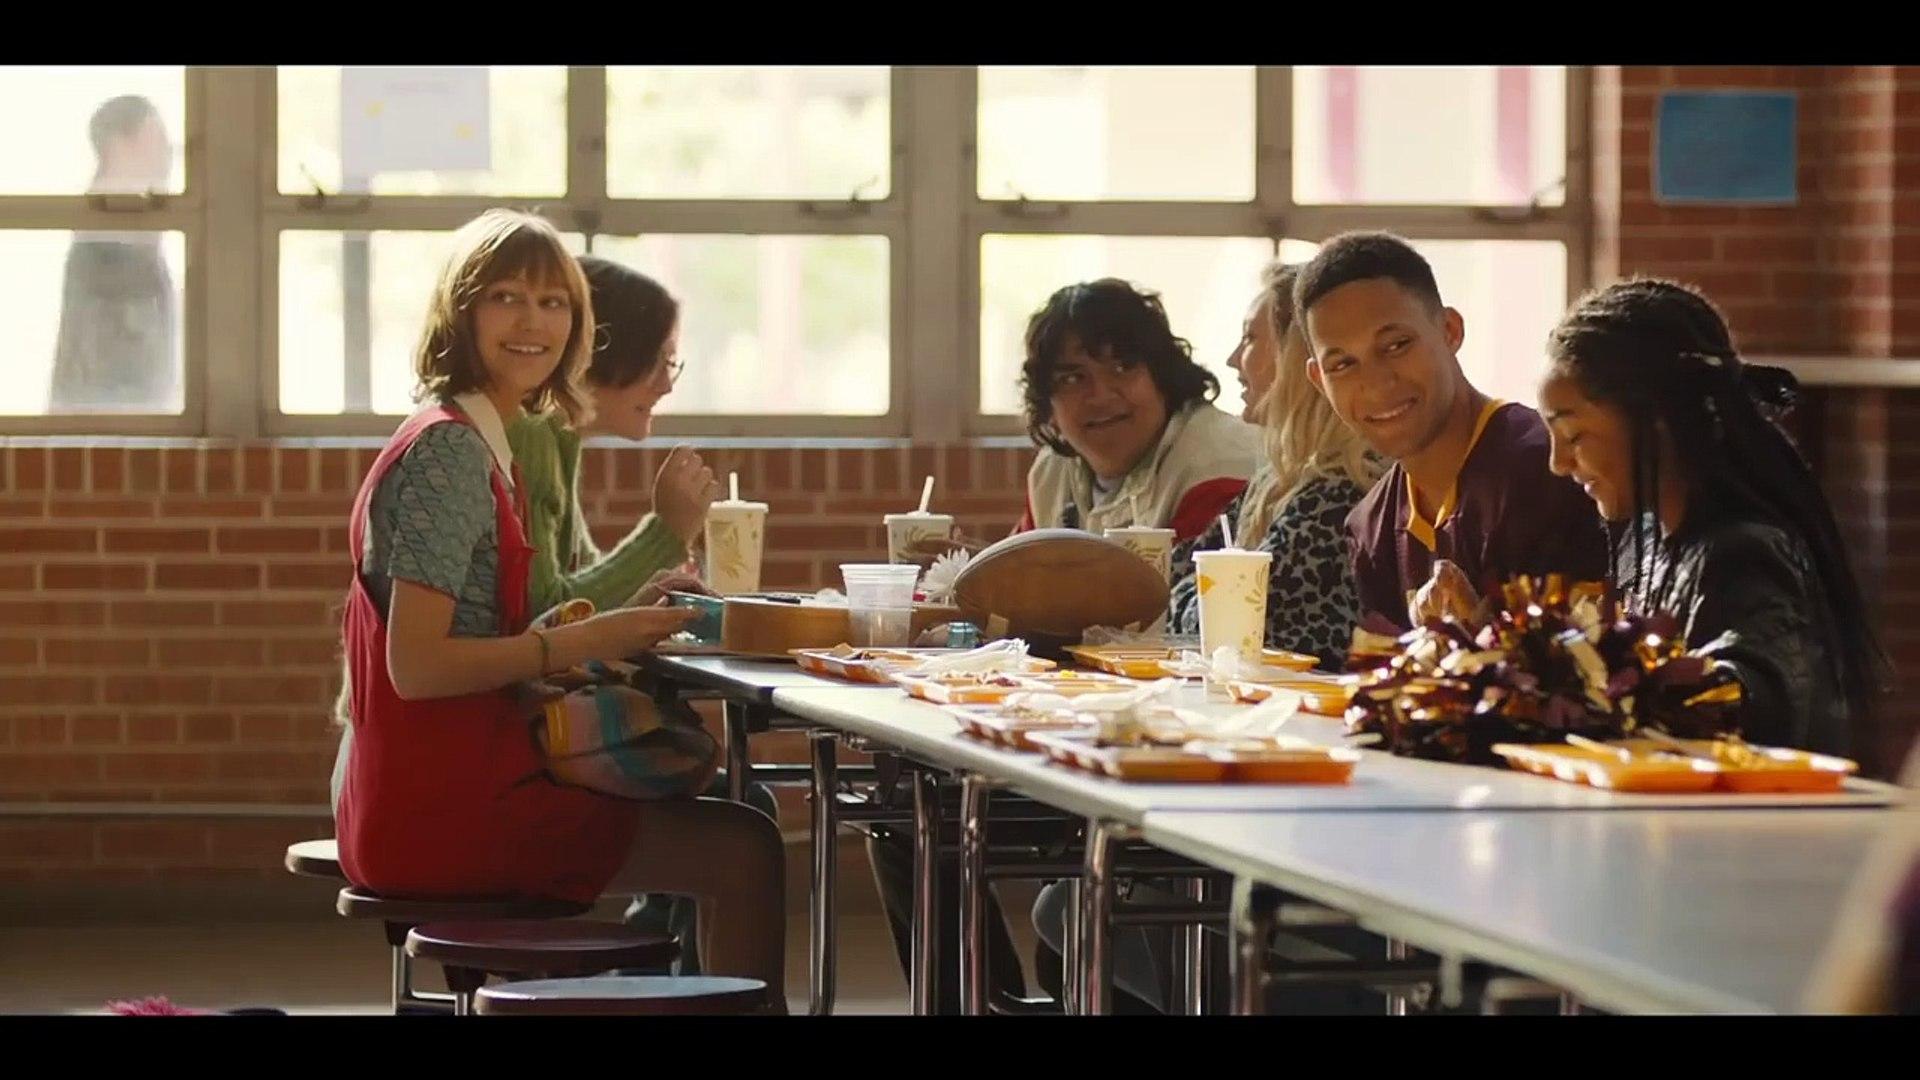 STARGIRL Official Trailer (2020) Disney+, Drama Movie HD